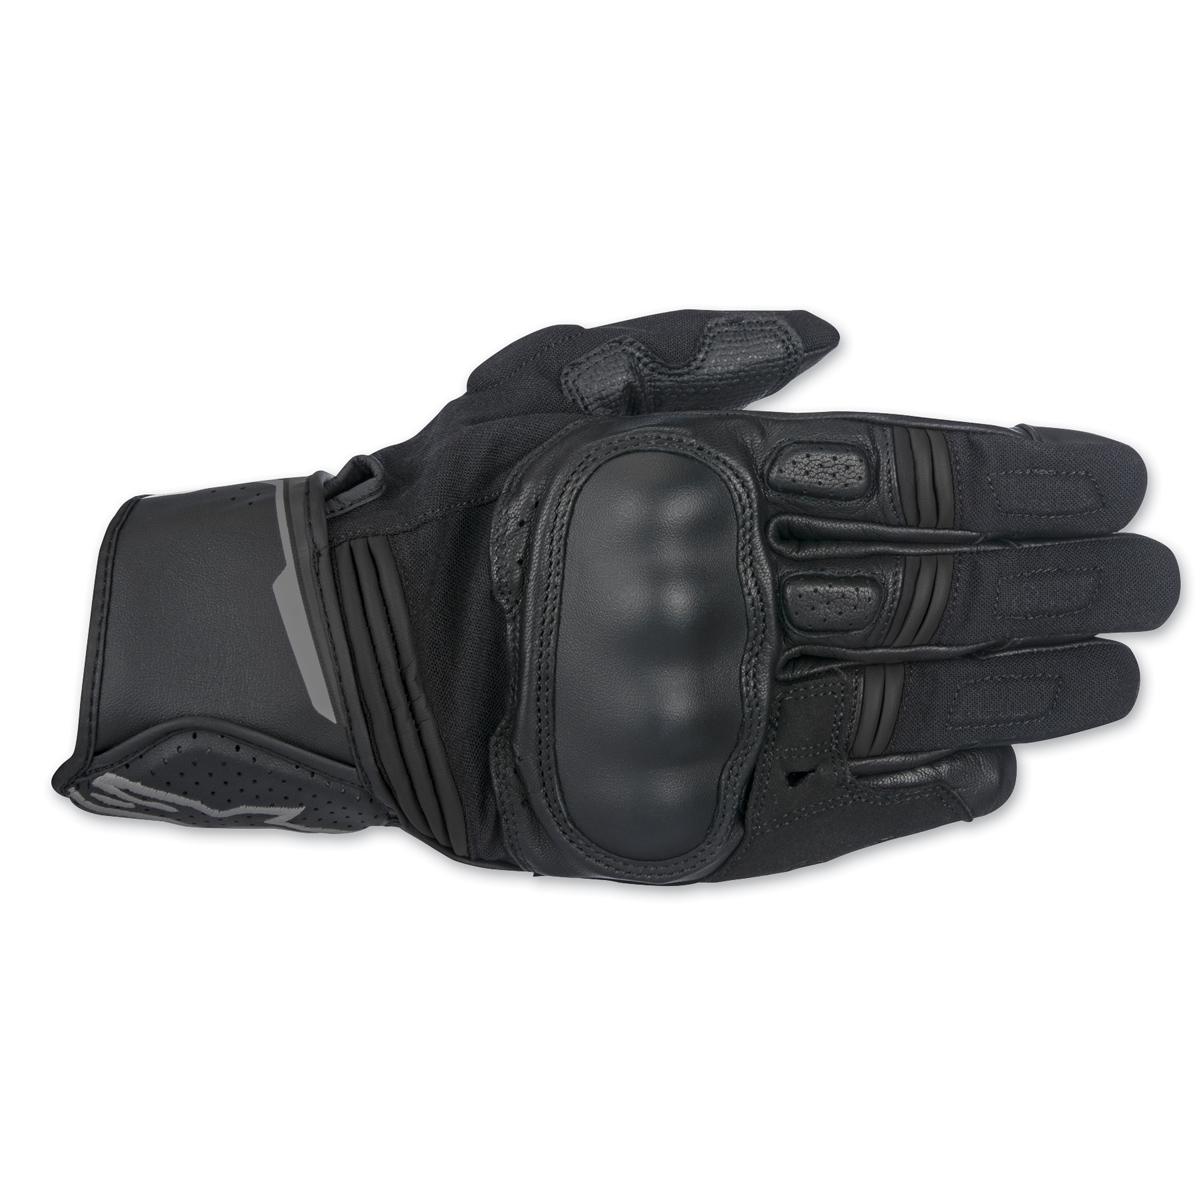 Alpinestars Men's Booster Black/Gray Gloves